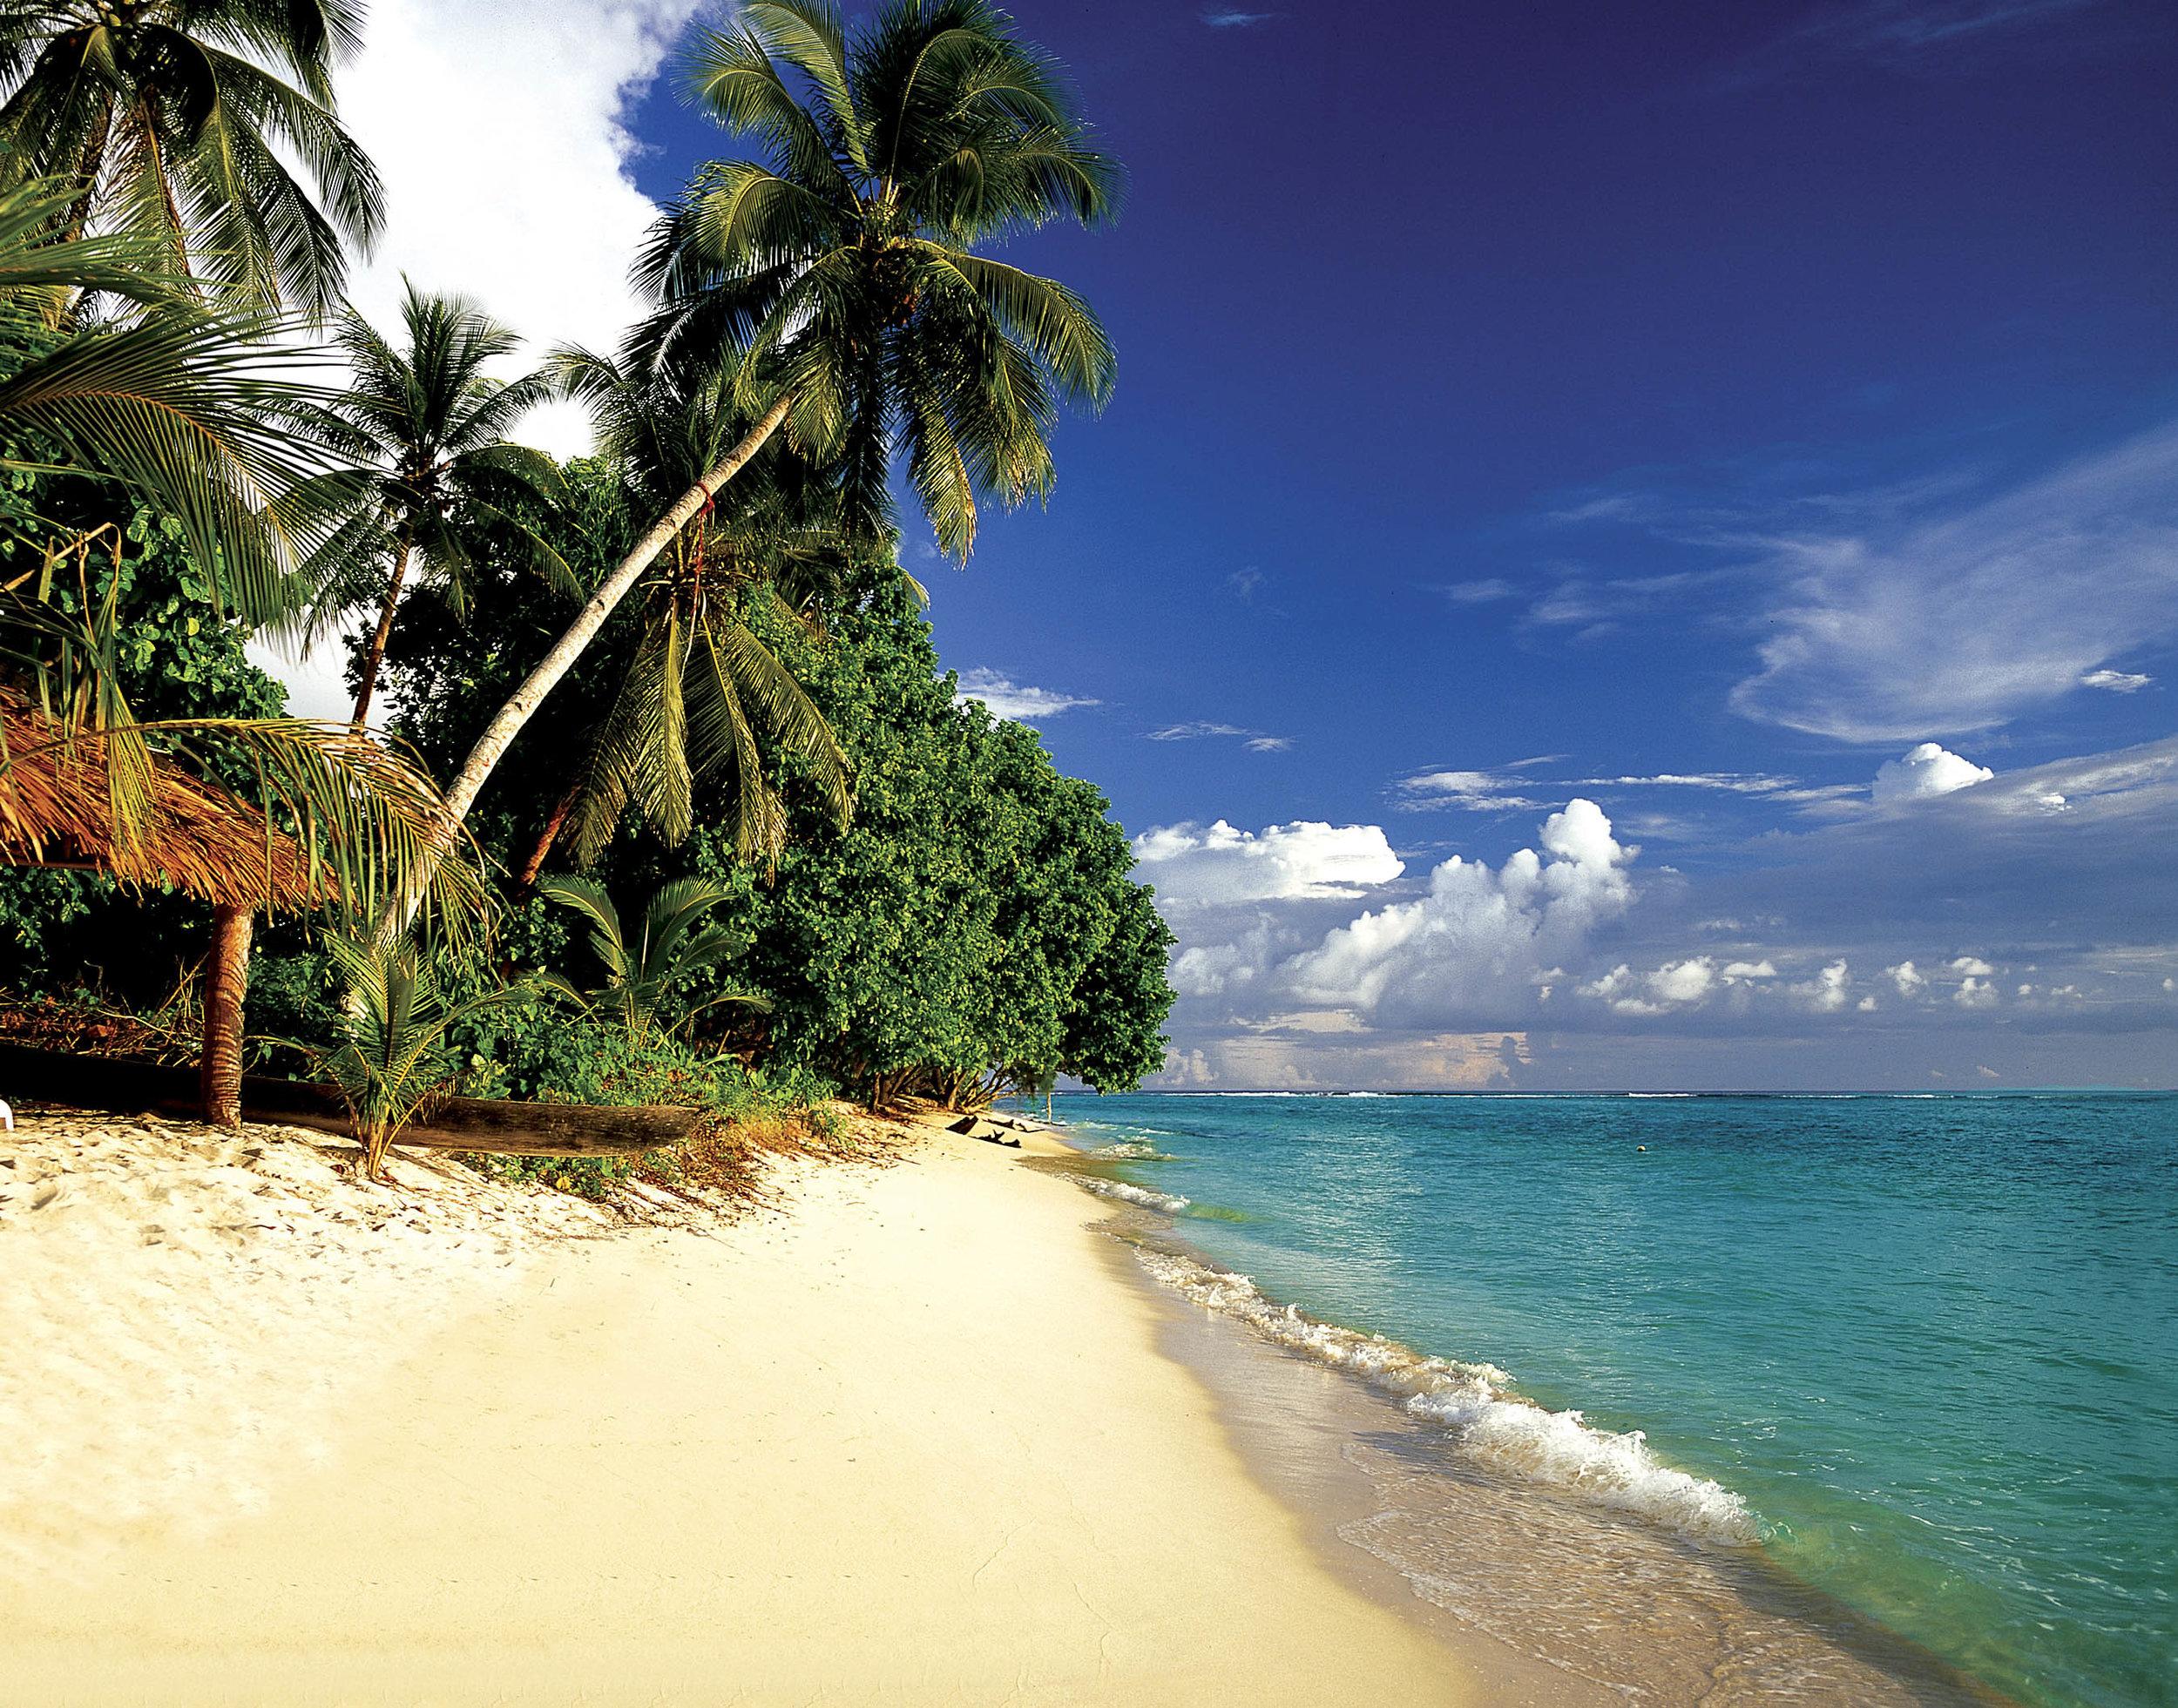 Solomon Islands (image care of the Solomon Islands Visitors Bureau).